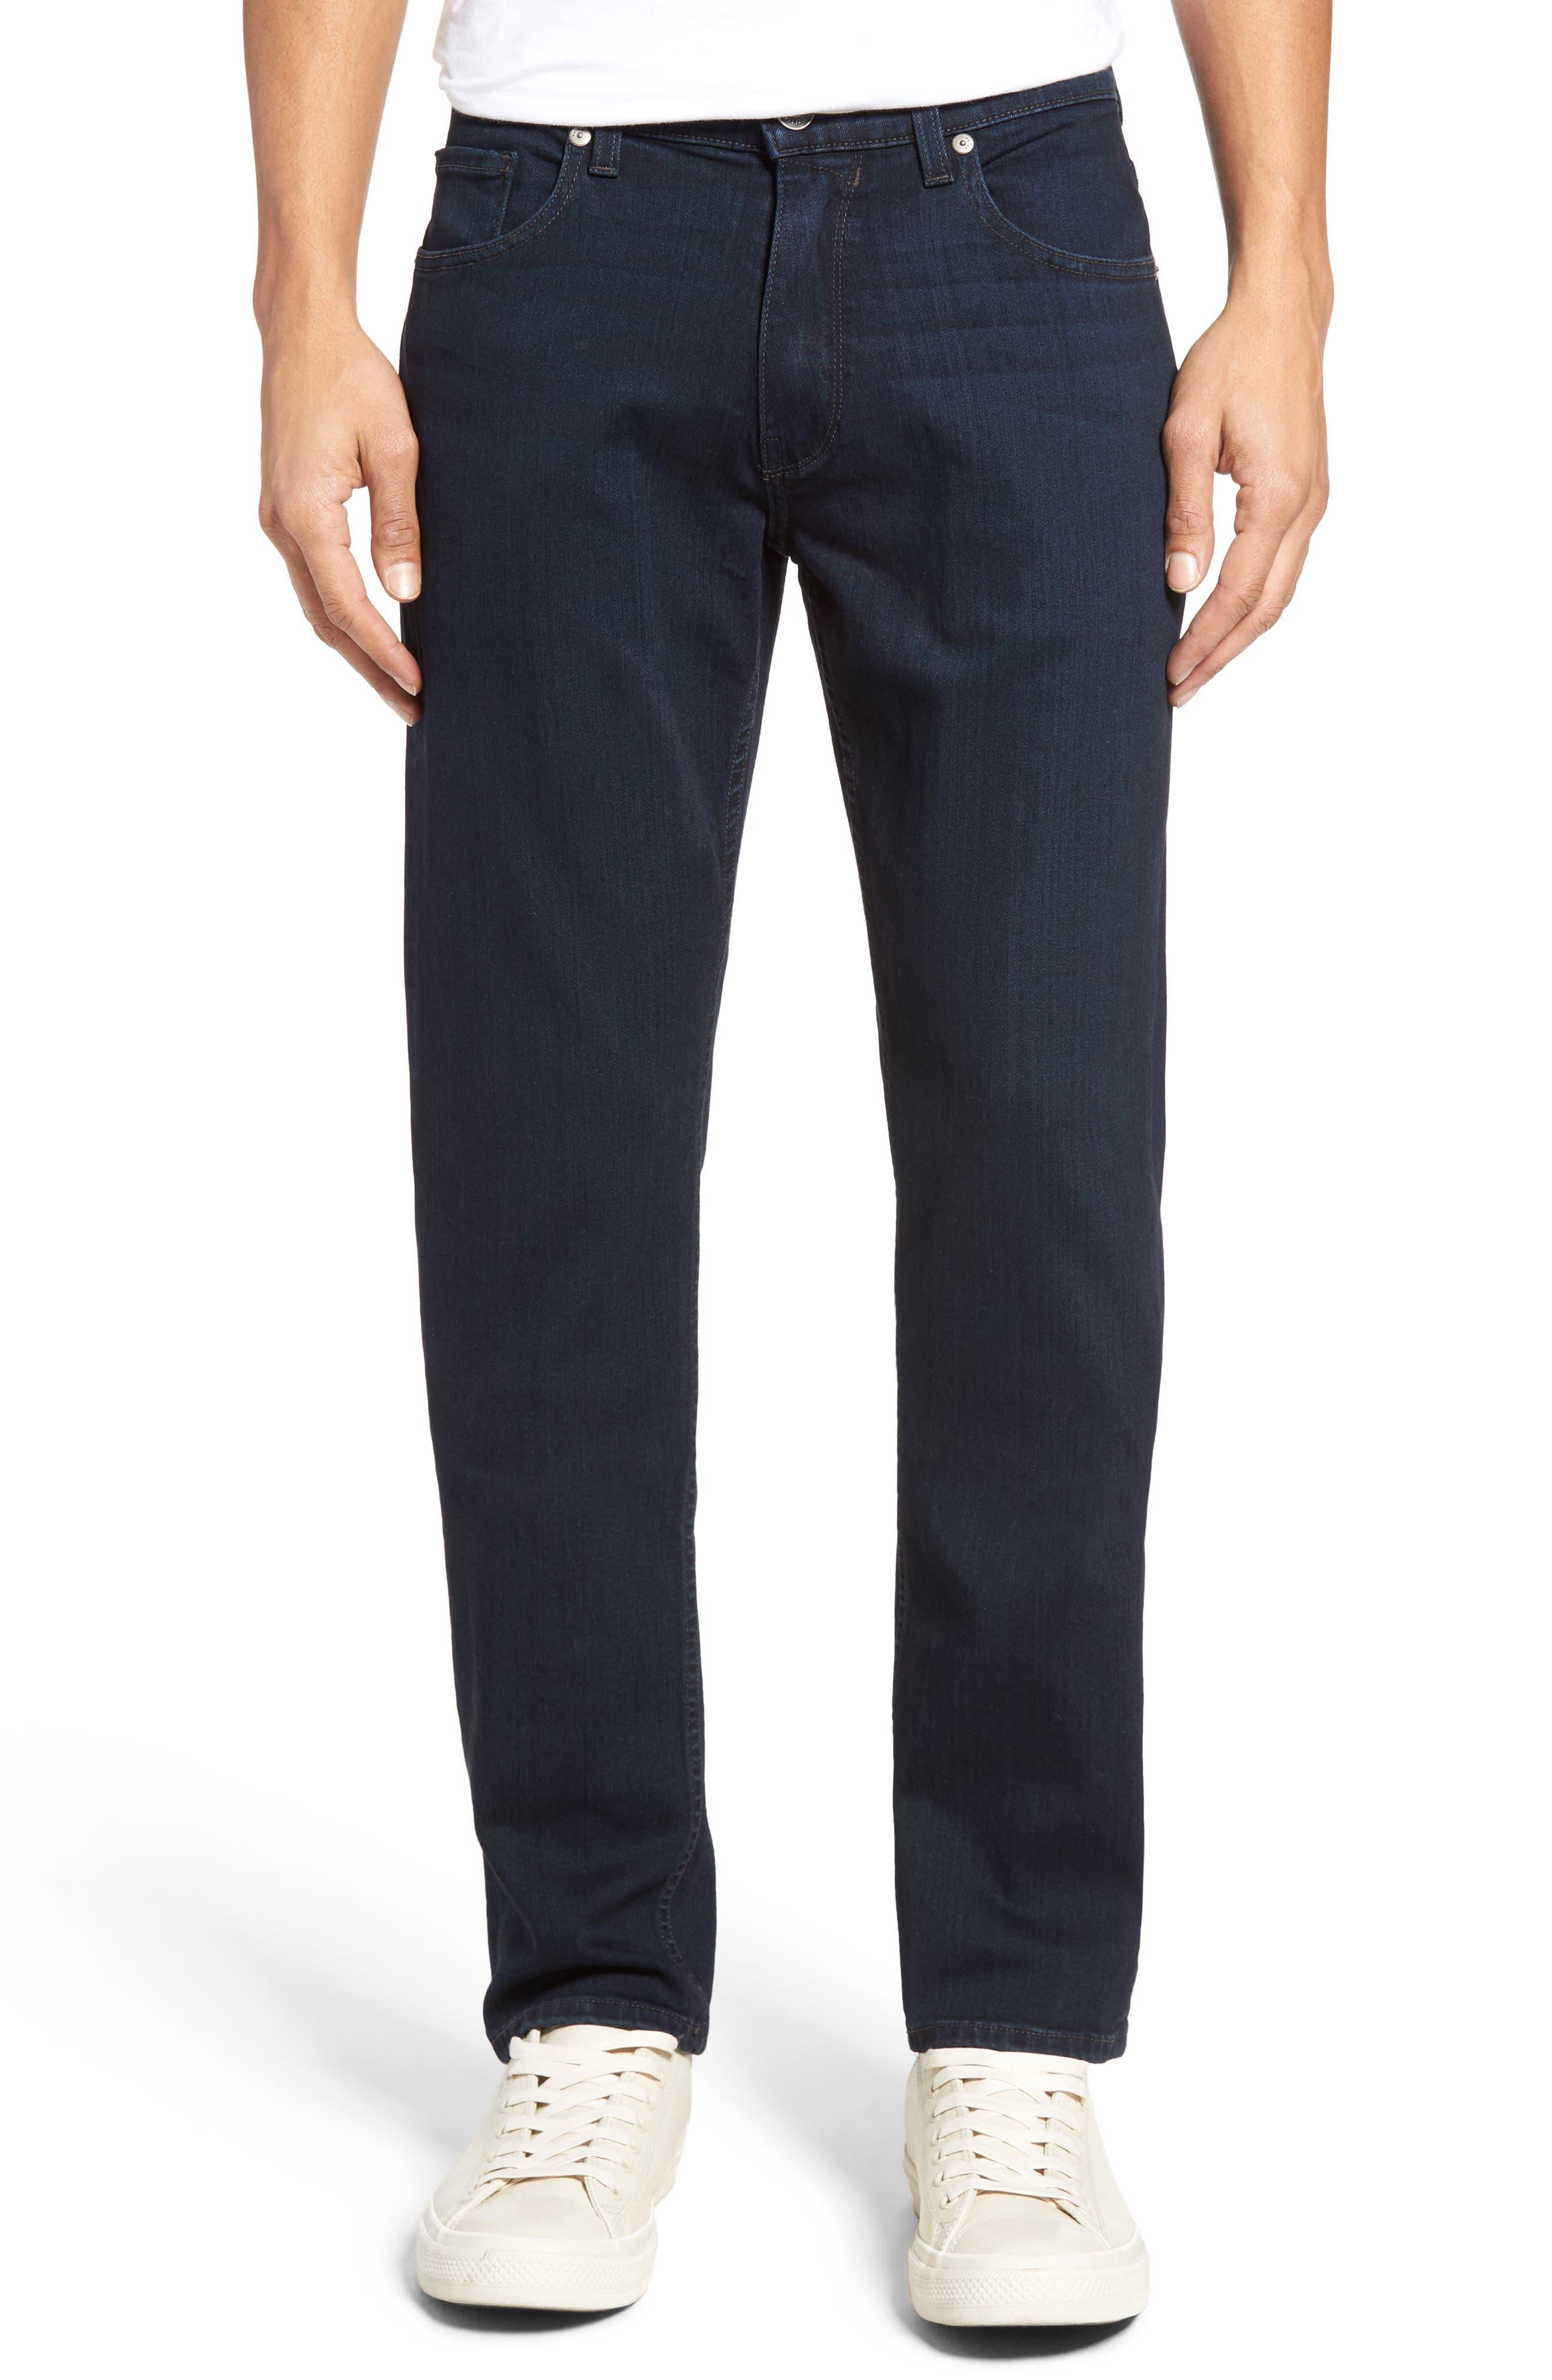 PAIGE Normandie Straight Leg Jeans, Main, color, ARLO